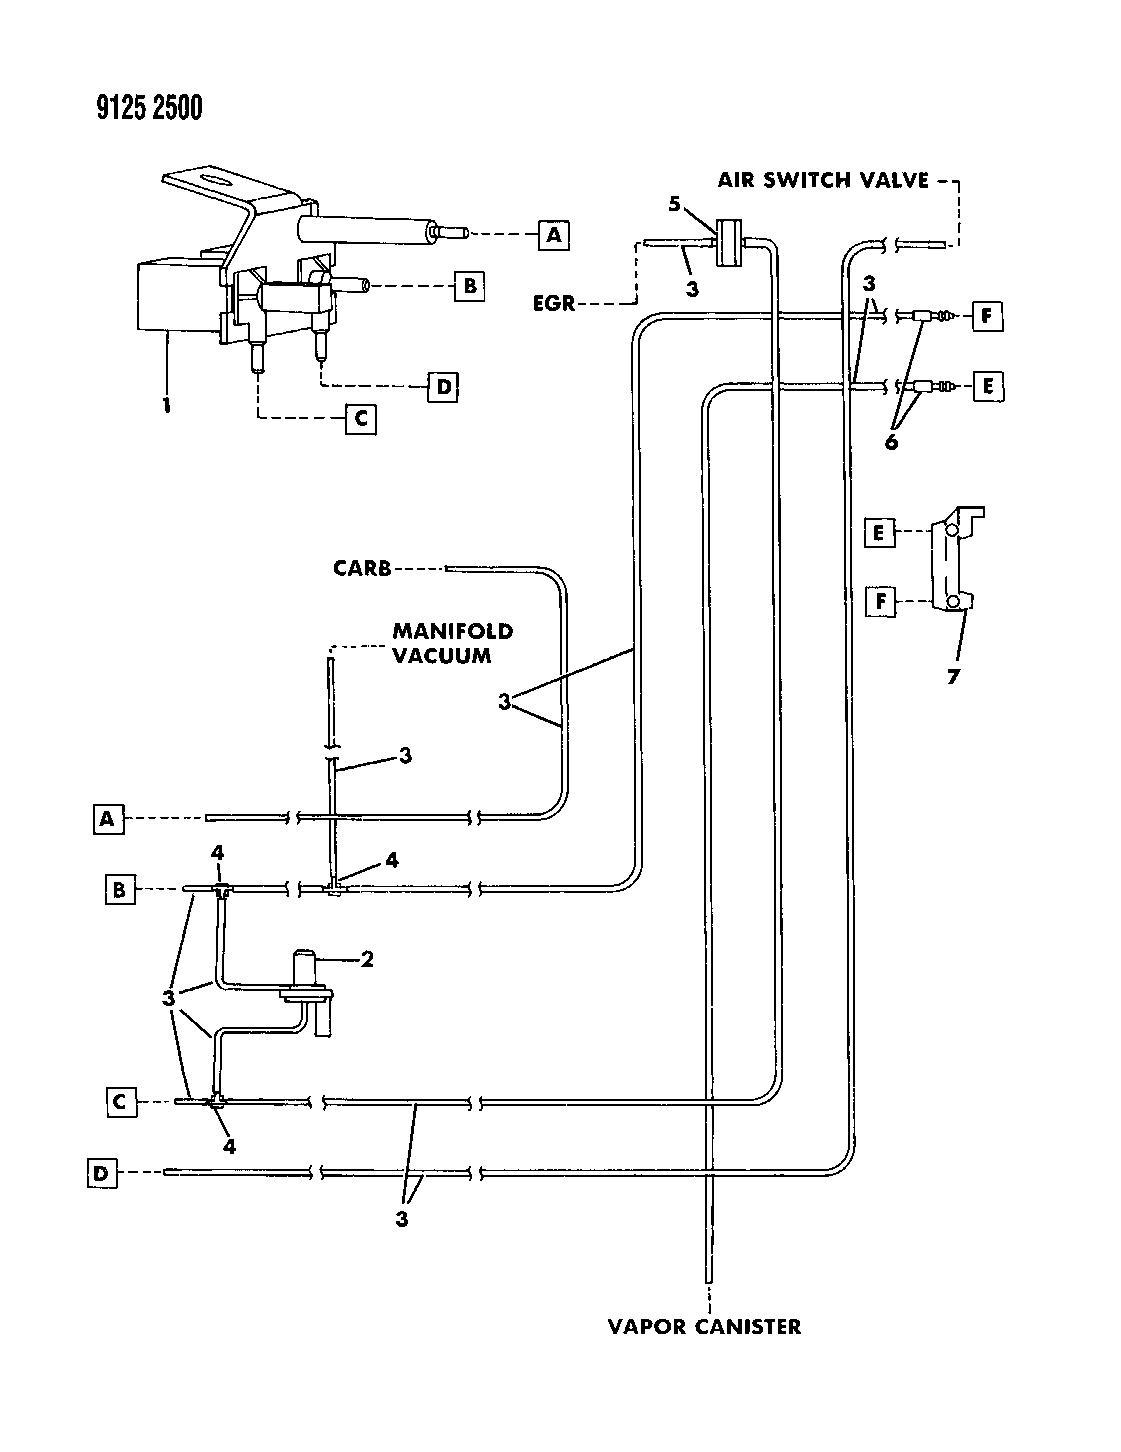 1989 chrysler tc maserati egr hose harness mopar parts giant rh moparpartsgiant com Wiring-Diagram 2000 Chrysler Voyager Chrysler Ignition Wiring Diagram